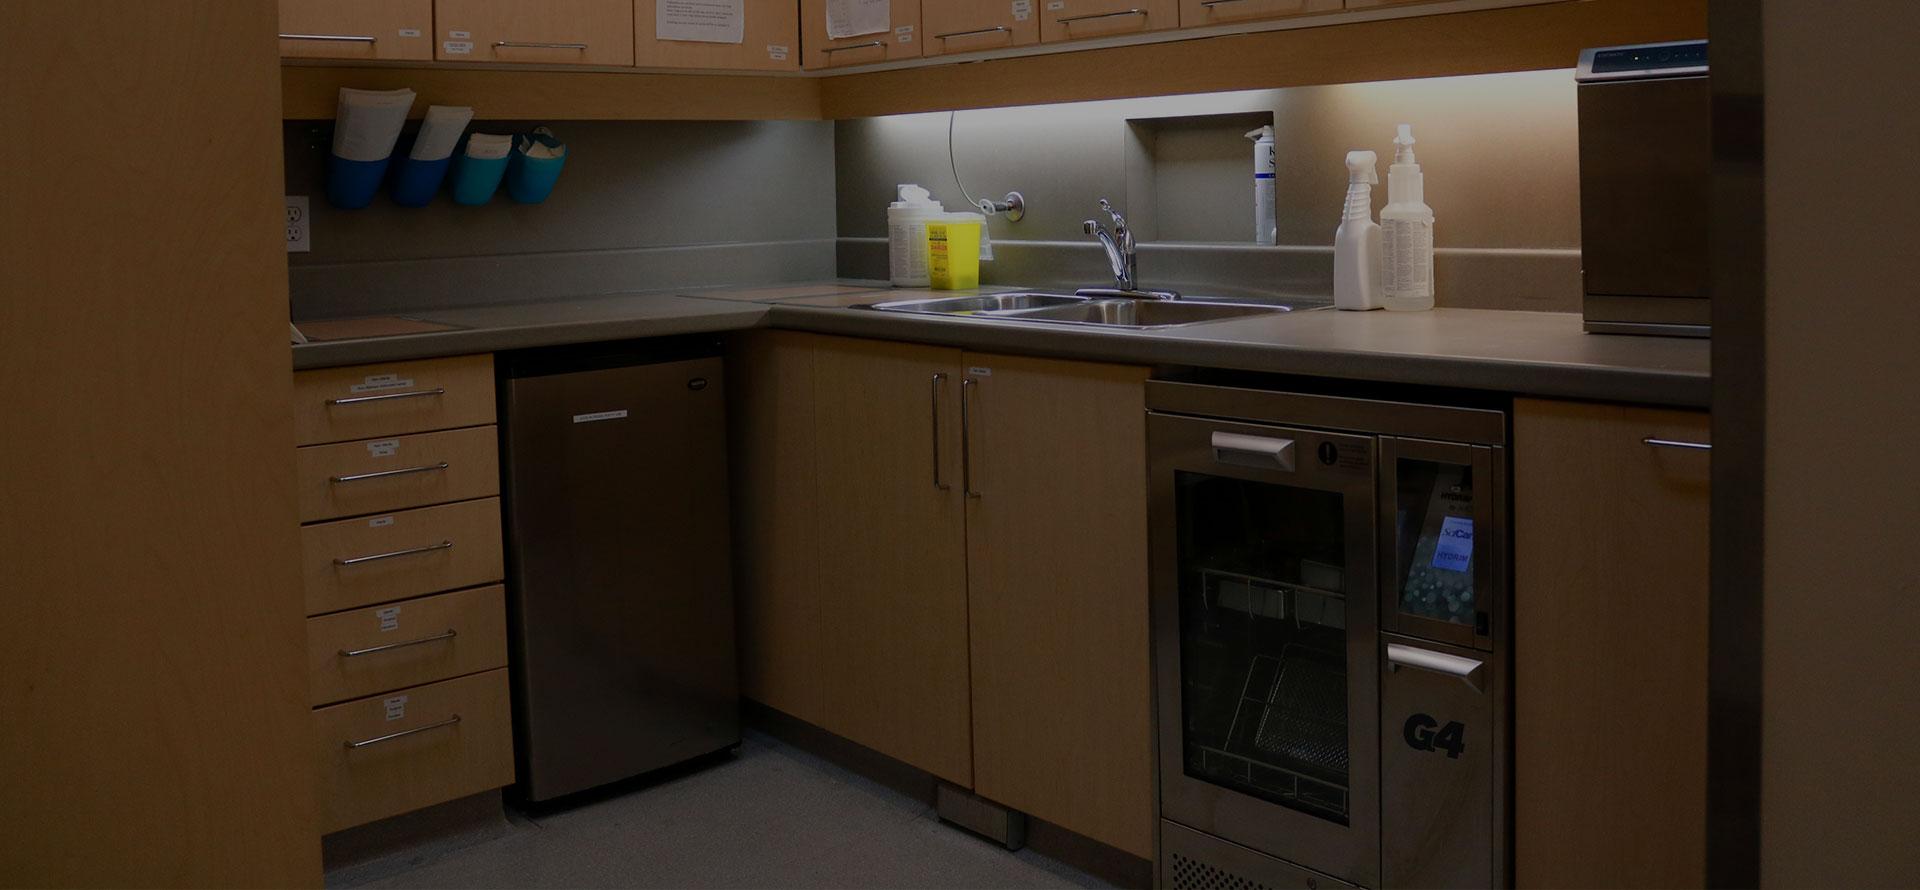 Sanitation Station | Paramount Dental | North Calgary | Family and General Dentist